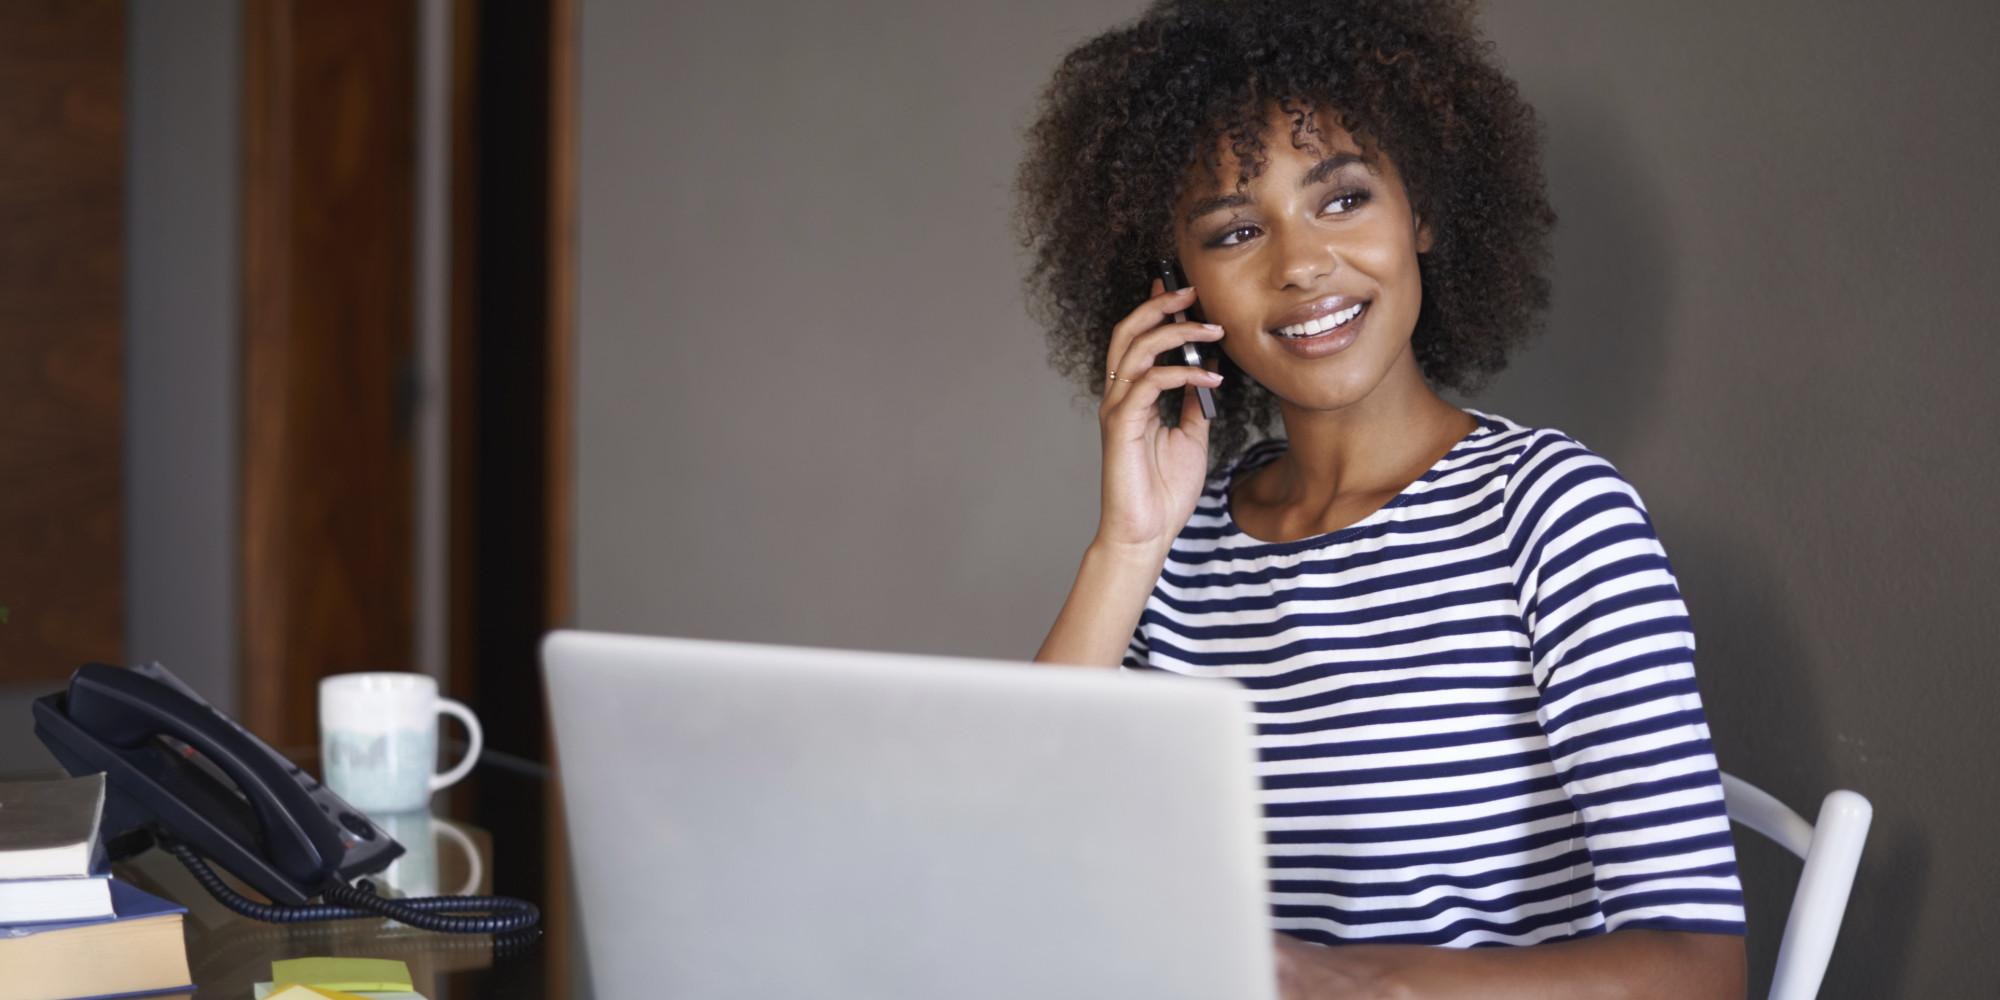 Resume Agency Woman on Phone